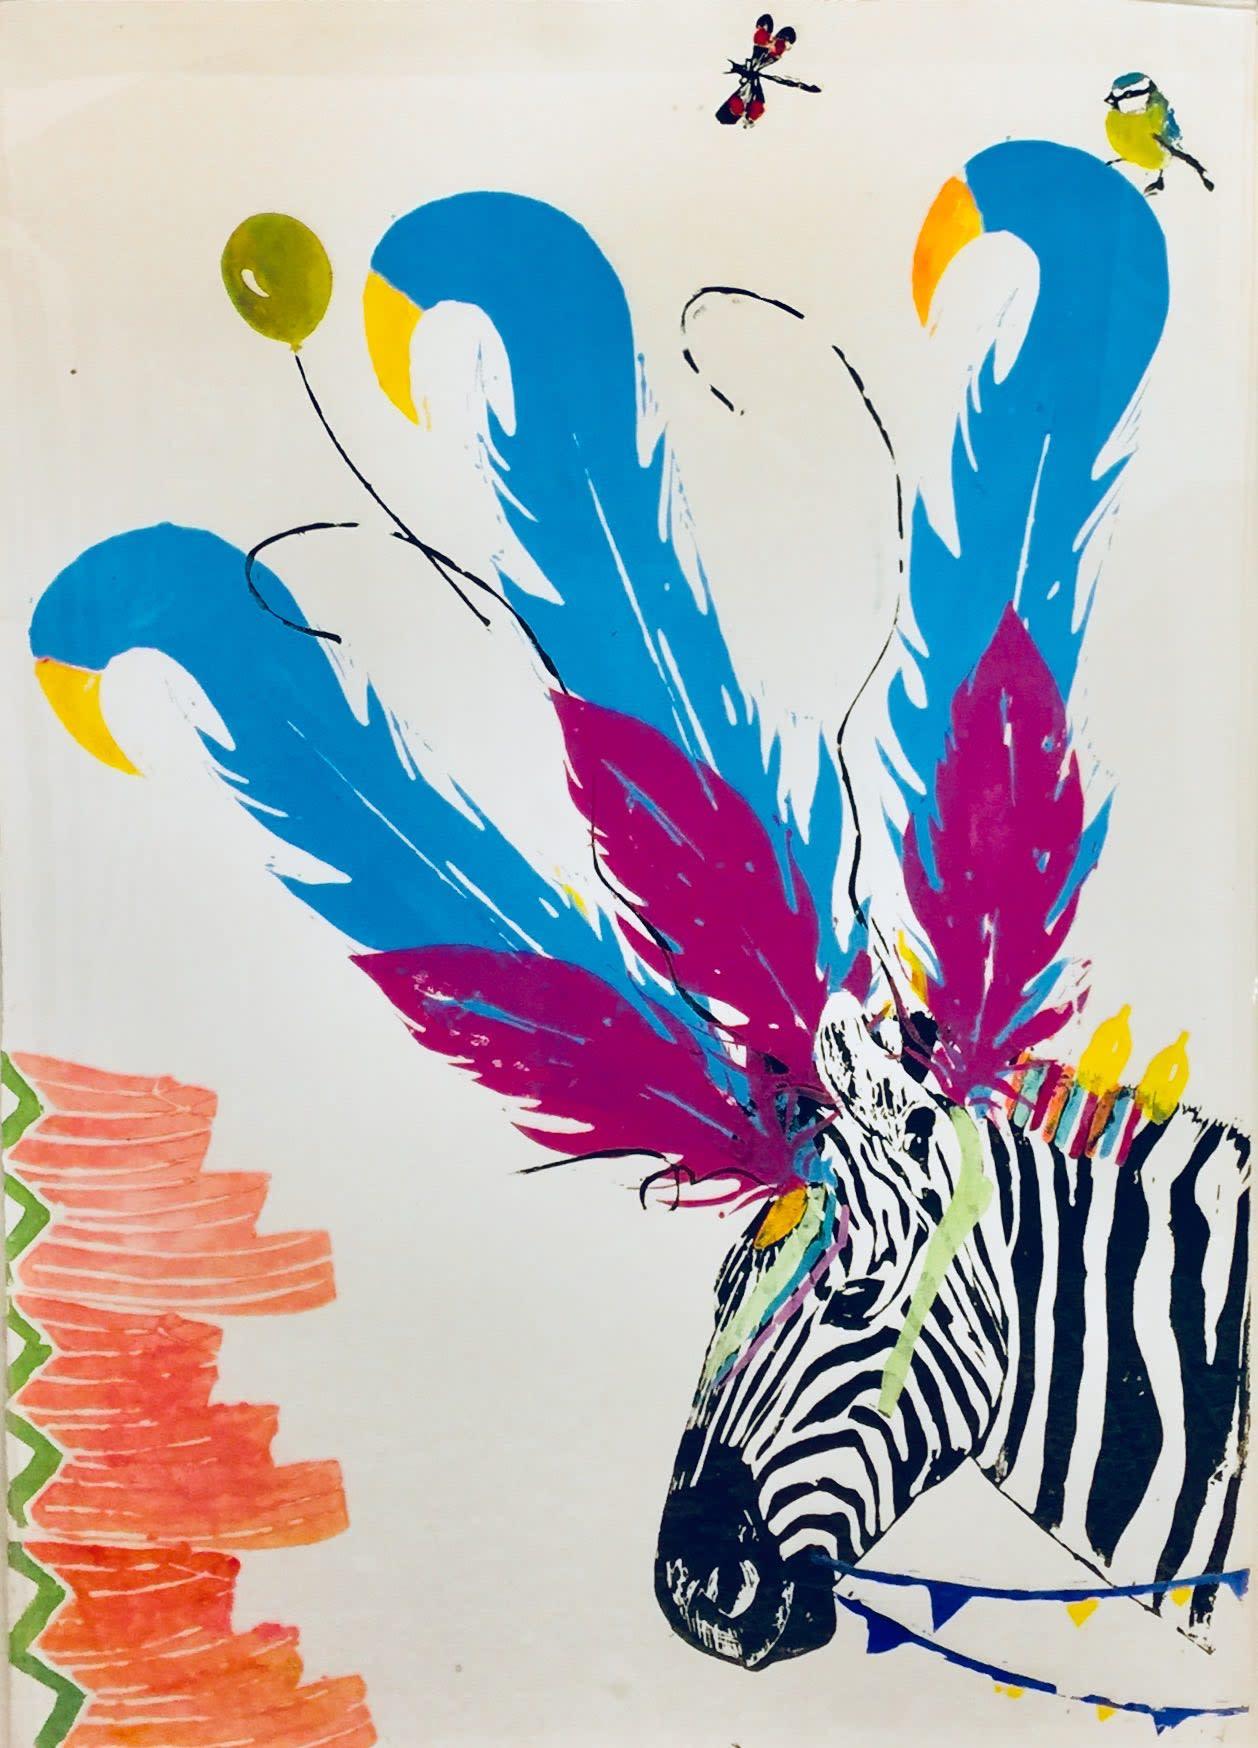 <span class=&#34;link fancybox-details-link&#34;><a href=&#34;/artists/39-millie-mccallum/works/2329-millie-mccallum-zebra-with-watermelon/&#34;>View Detail Page</a></span><div class=&#34;artist&#34;><strong>Millie McCallum</strong></div> <div class=&#34;title&#34;><em>Zebra with Watermelon</em></div> <div class=&#34;medium&#34;>Linocut 1/1 (framed)</div> <div class=&#34;dimensions&#34;>100 x 70 cm (paper size)</div><div class=&#34;price&#34;>£875.00</div><div class=&#34;copyright_line&#34;>Copyright The Artist</div>